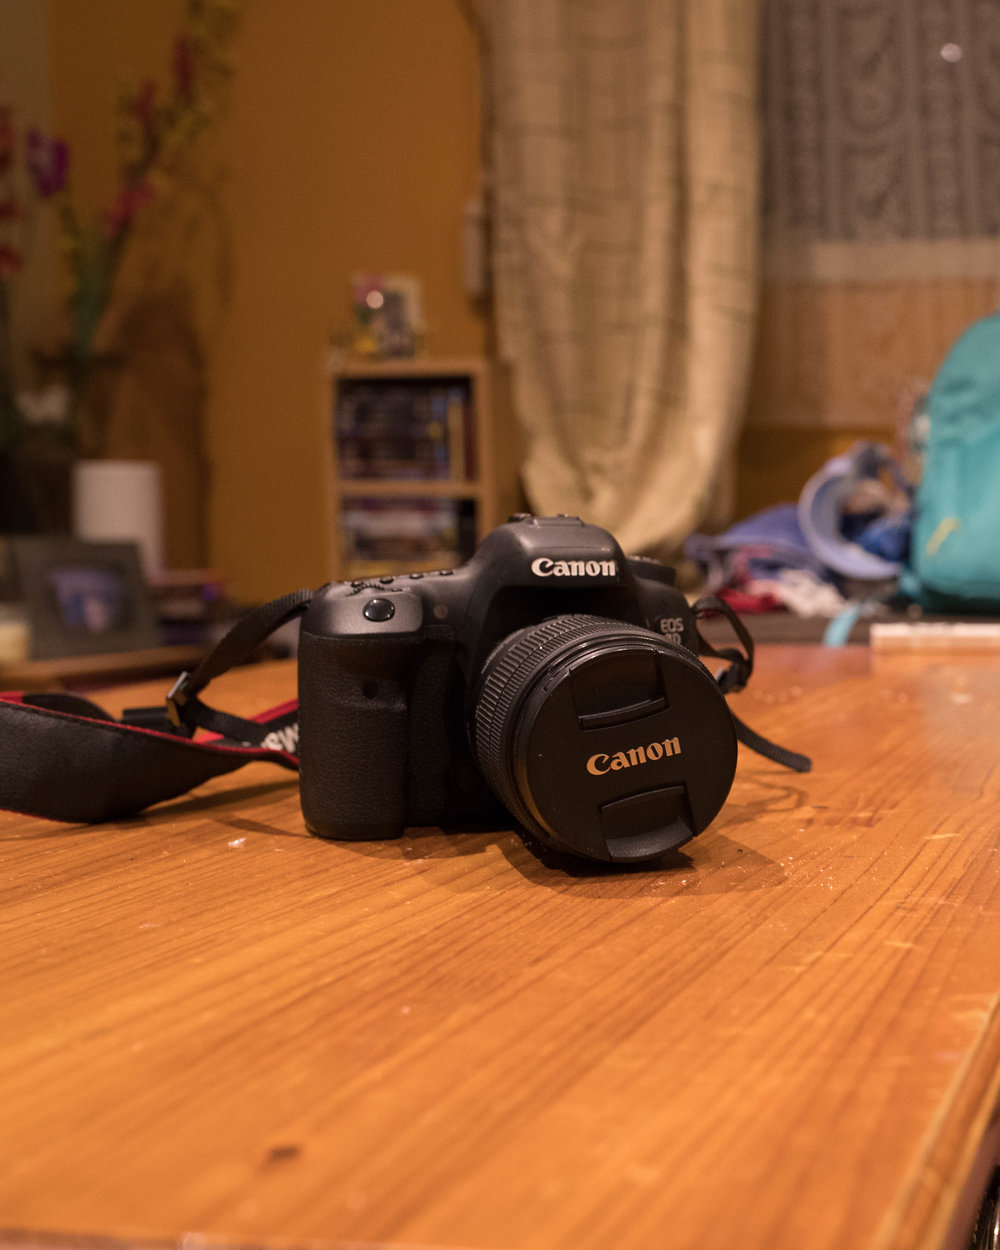 Shot at 35mm Focal- Aperture f5.6